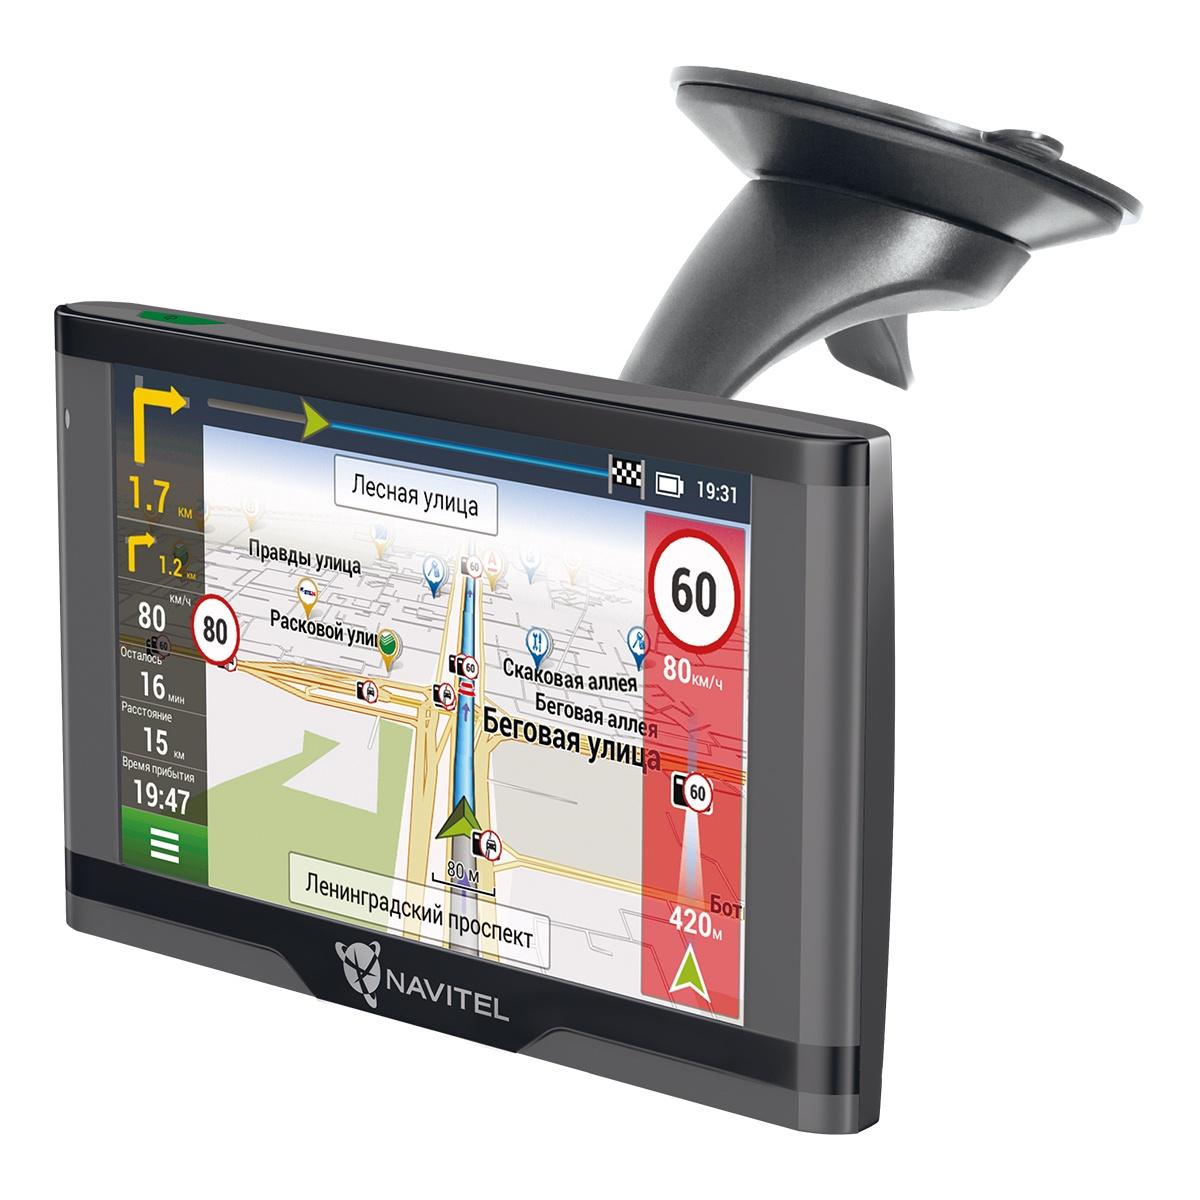 Автомобильный навигатор Navitel N500 Magnetic, N500MAGNETIC, черный